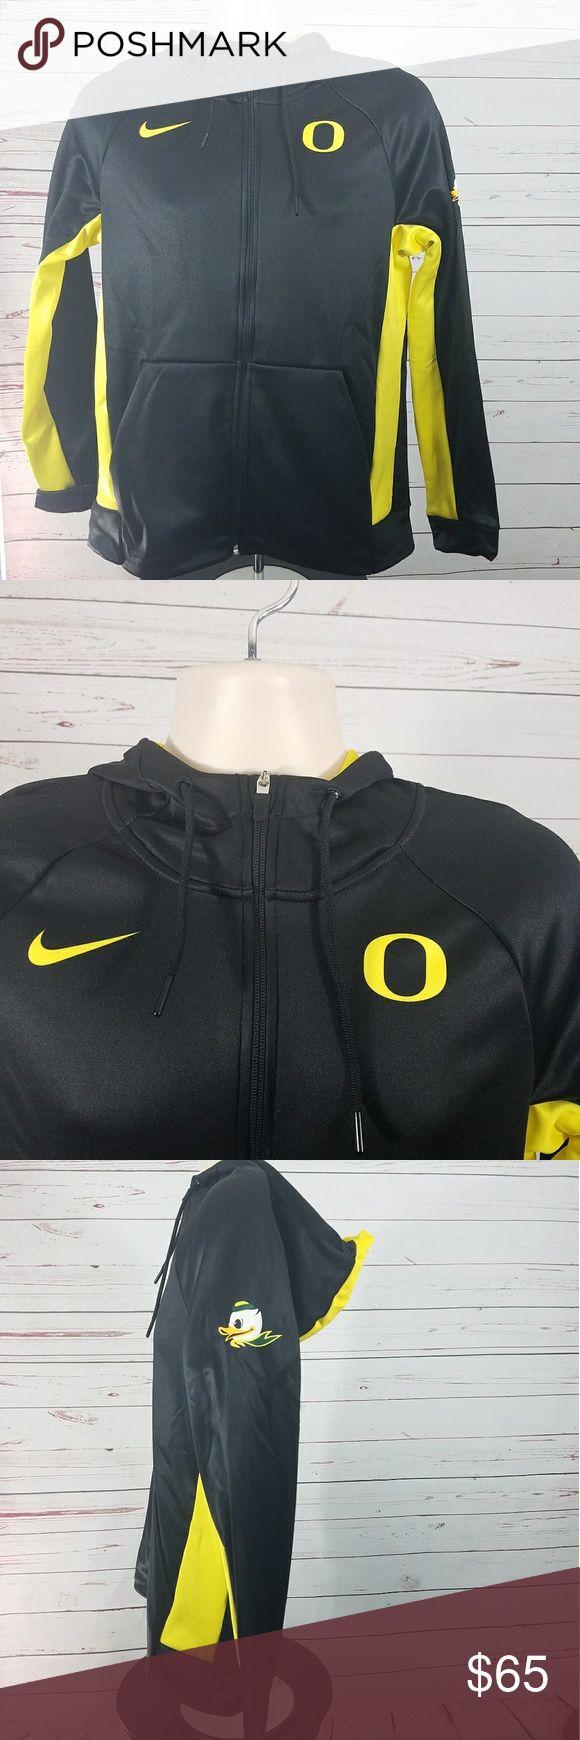 Oregon Ducks Hoodie Nike Medium Brand new women's hoodie by Nike Size medium hang 1 Nike Jackets & Coats